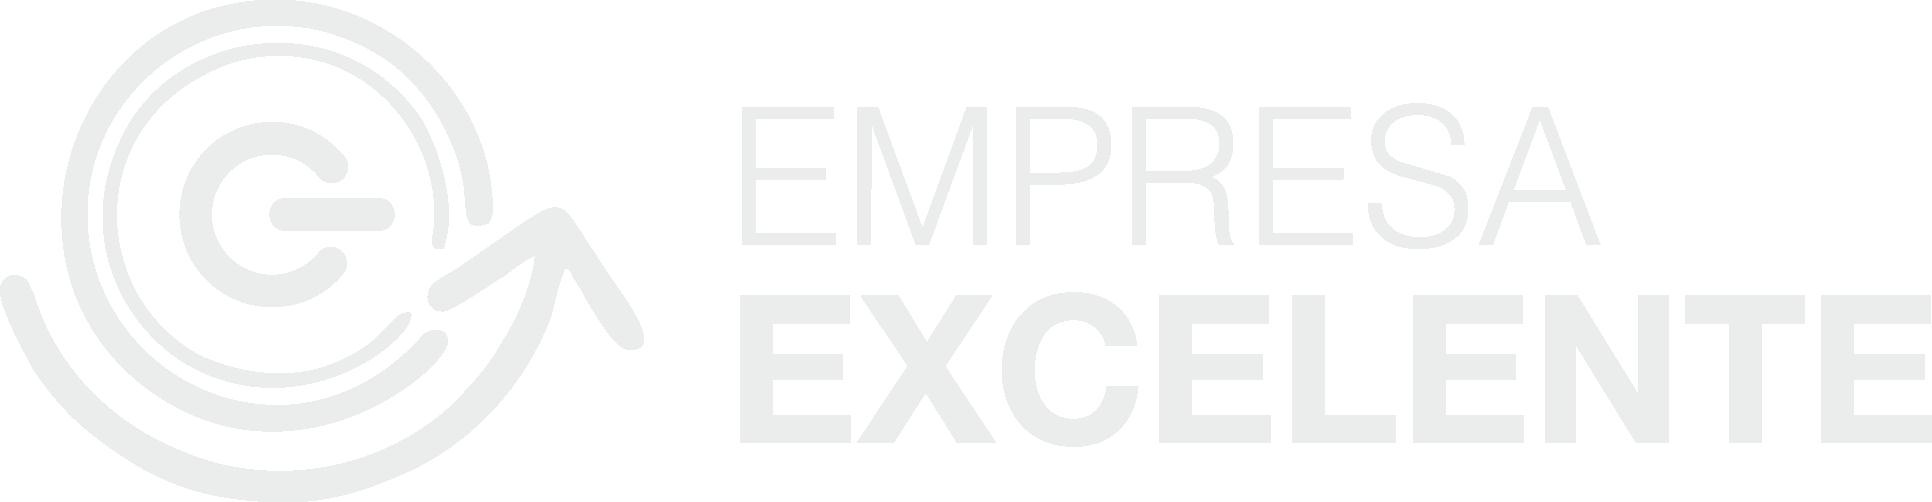 Excelencia Empresarial Extremadura